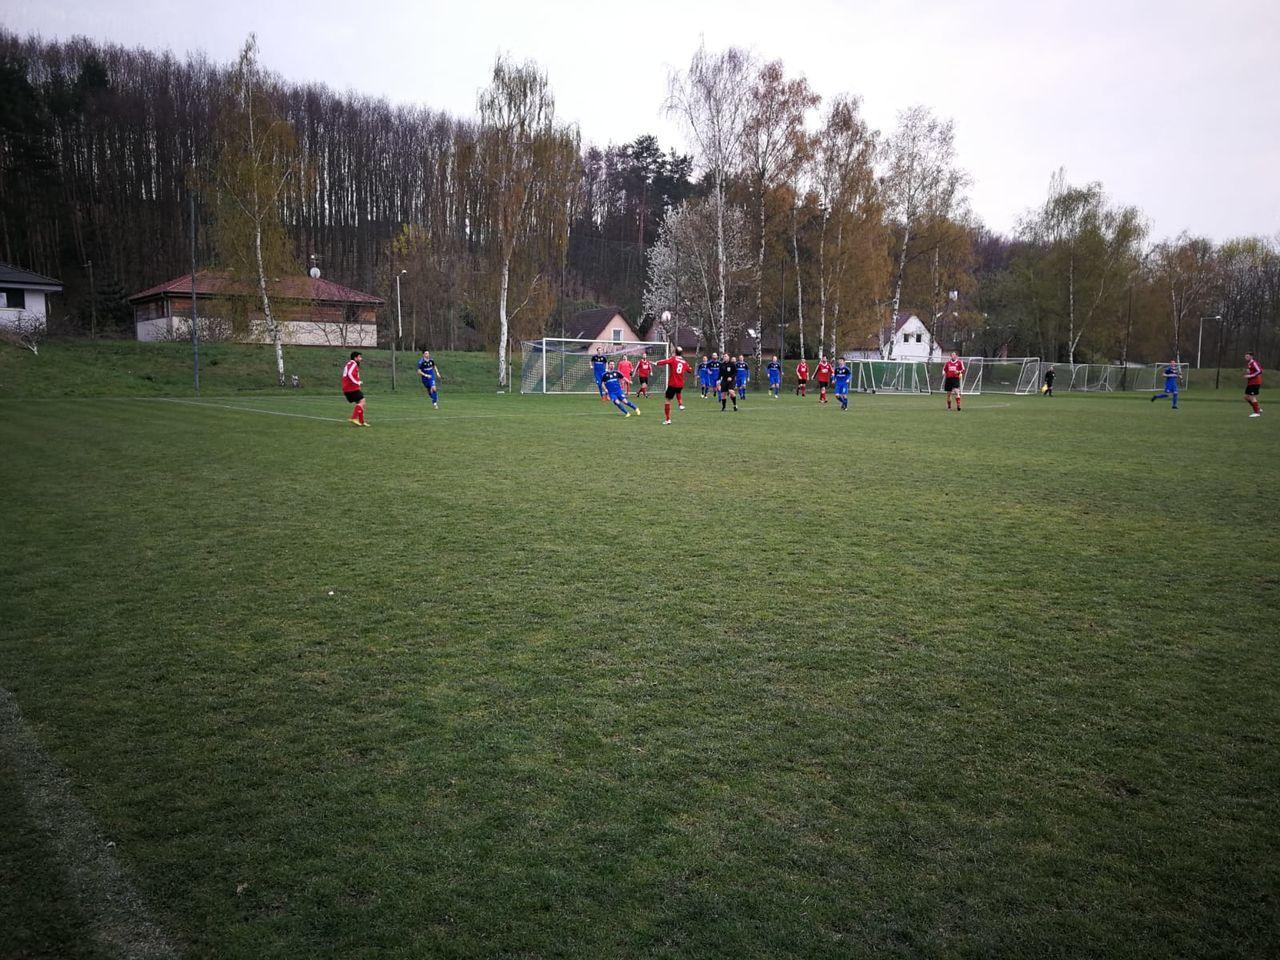 Spartak Hrdlořezy - SC Xaverov 4:0 Jaro 2019